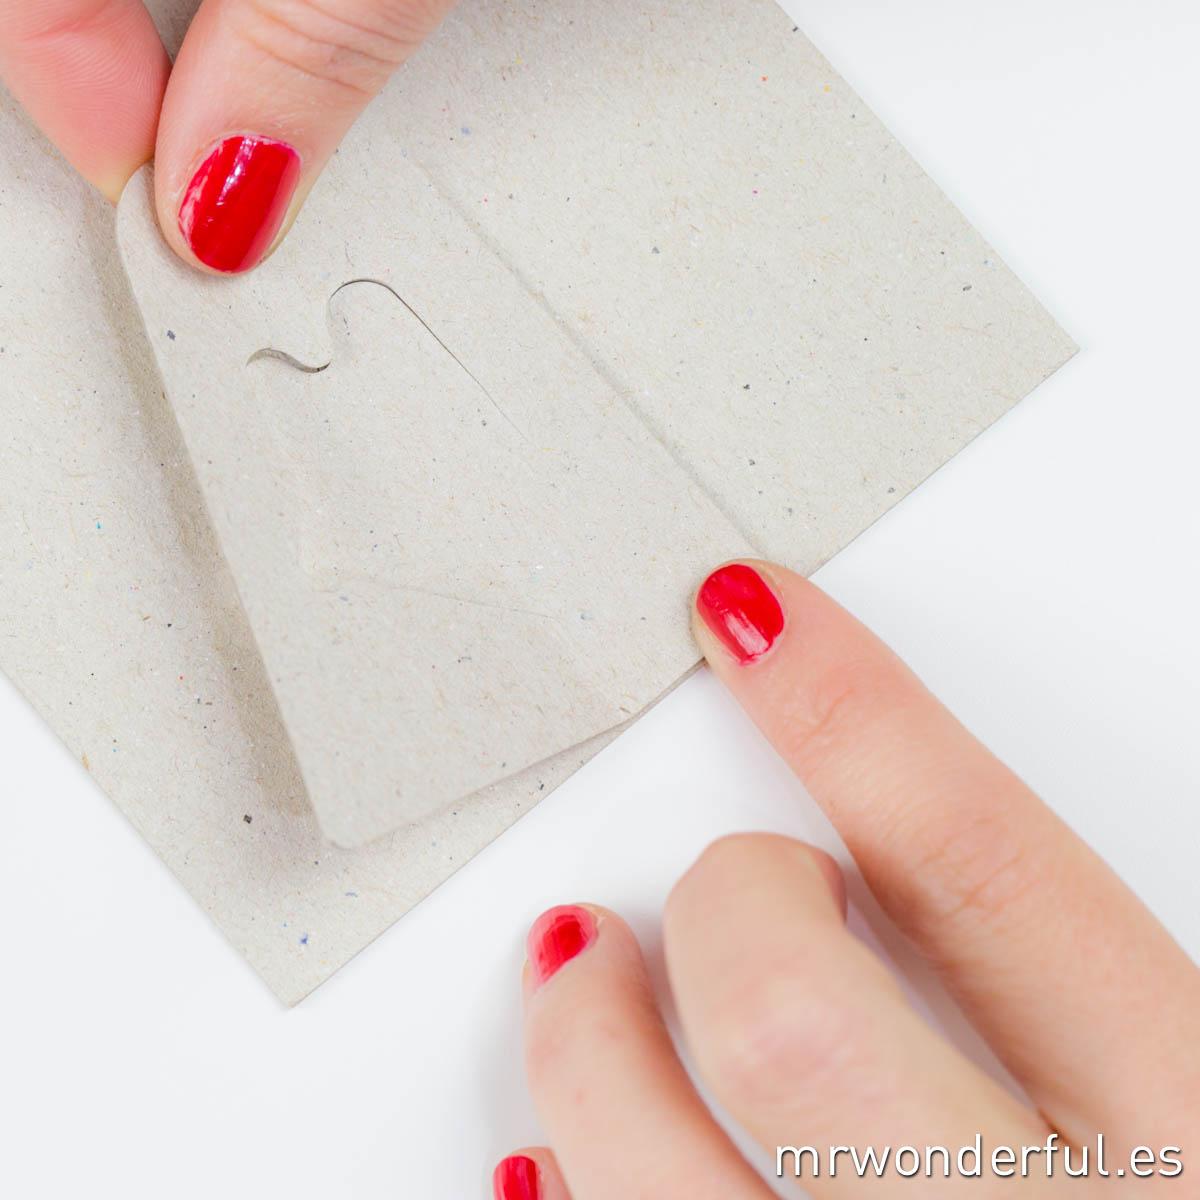 mrwonderful_tarjetas_carton_peana-22